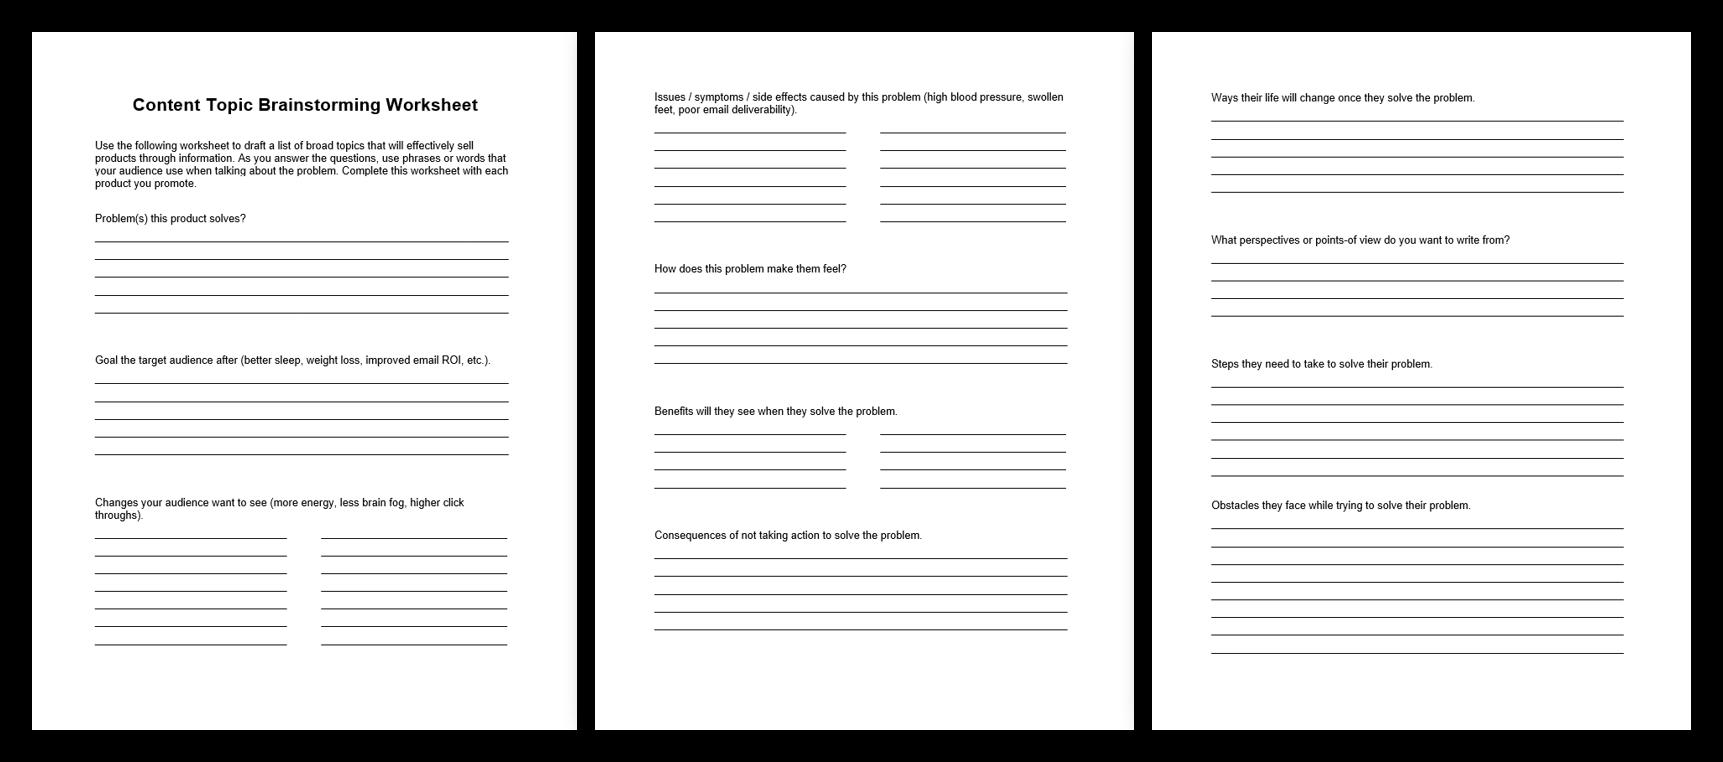 Content Brainstorming Worksheet